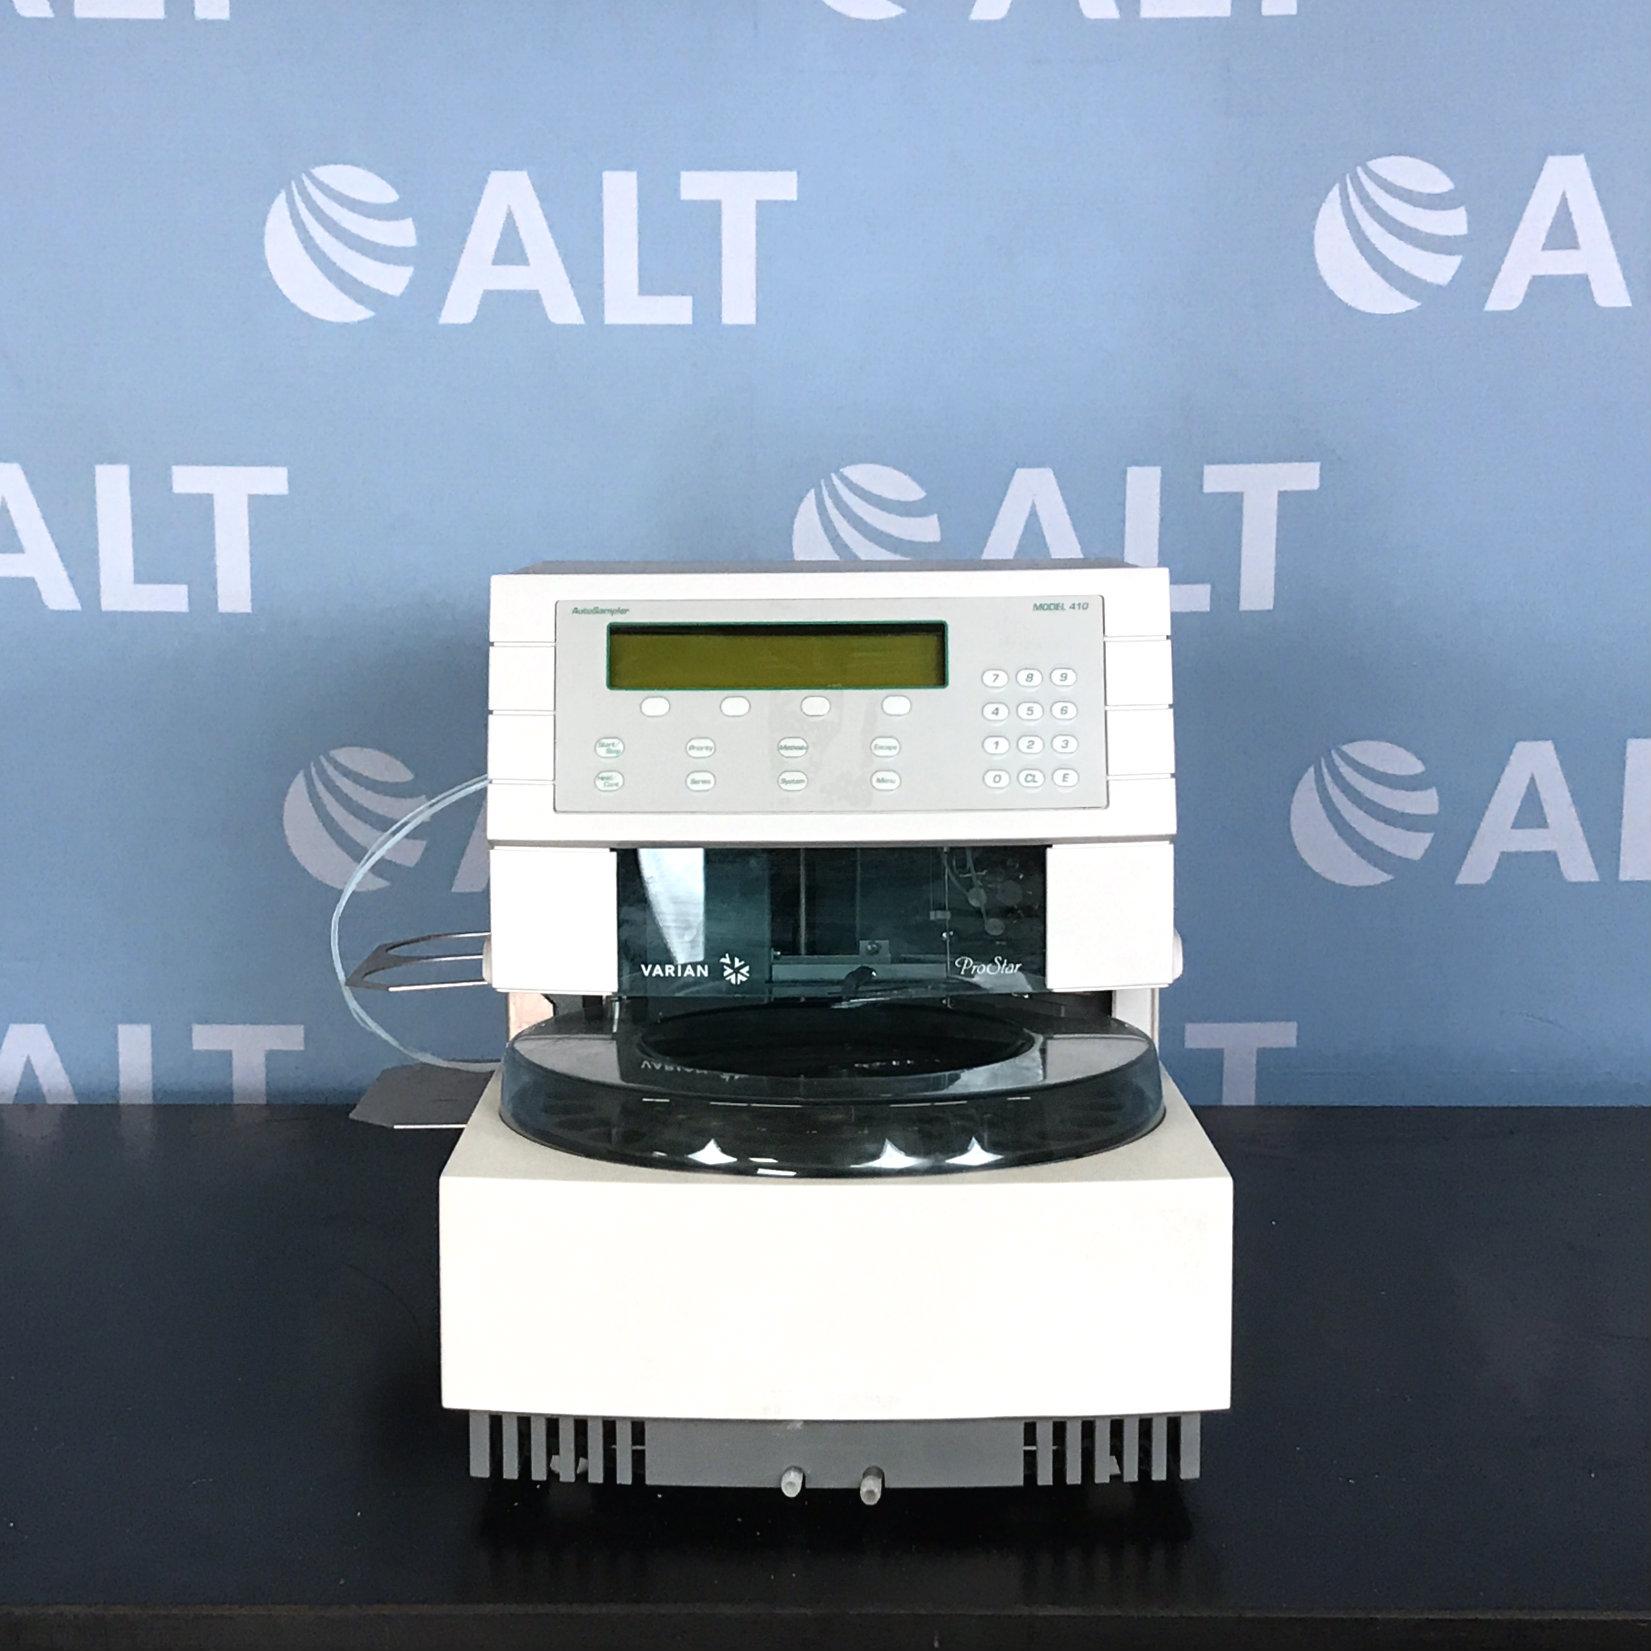 Varian ProStar 410 HPLC Autosampler Image